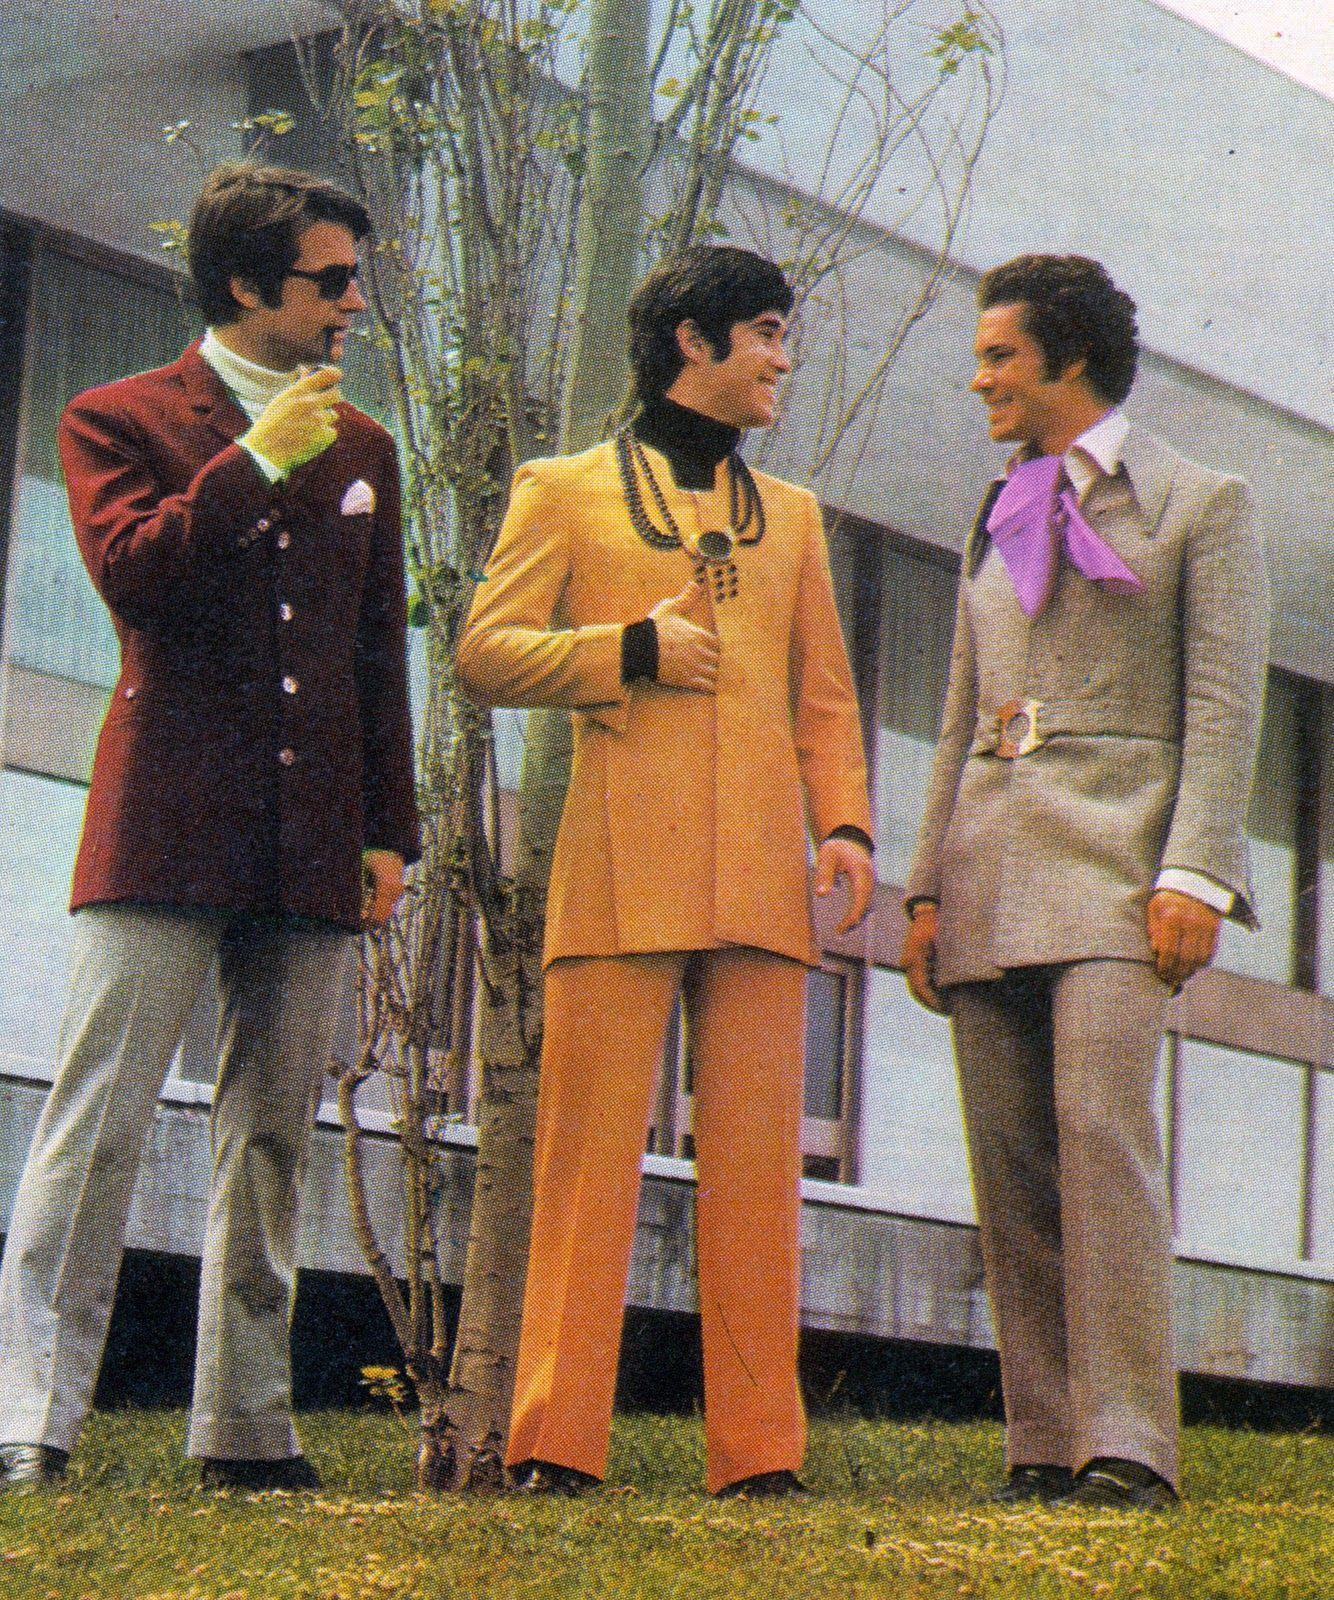 Fashion of 1970s - 1970s Clothing Advertisements Show Decade S Cringe Worthy Fashion